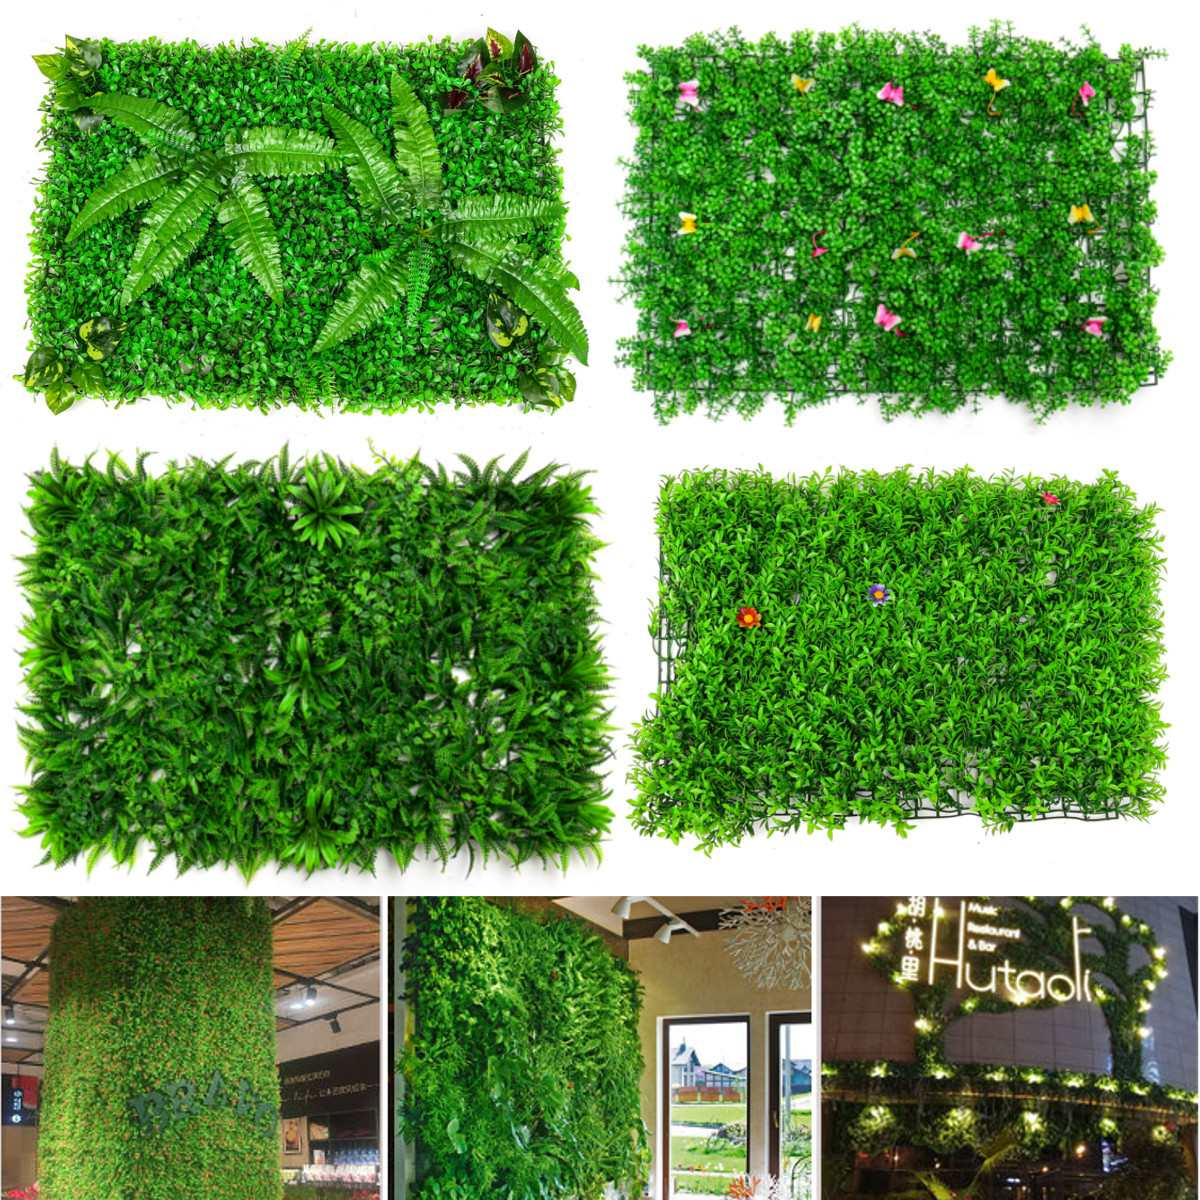 Artificial Plant Foliage Hedge Grass Moss Carpet Grass-Mat Greenery Grass Wall Panel Wedding Party Decoration